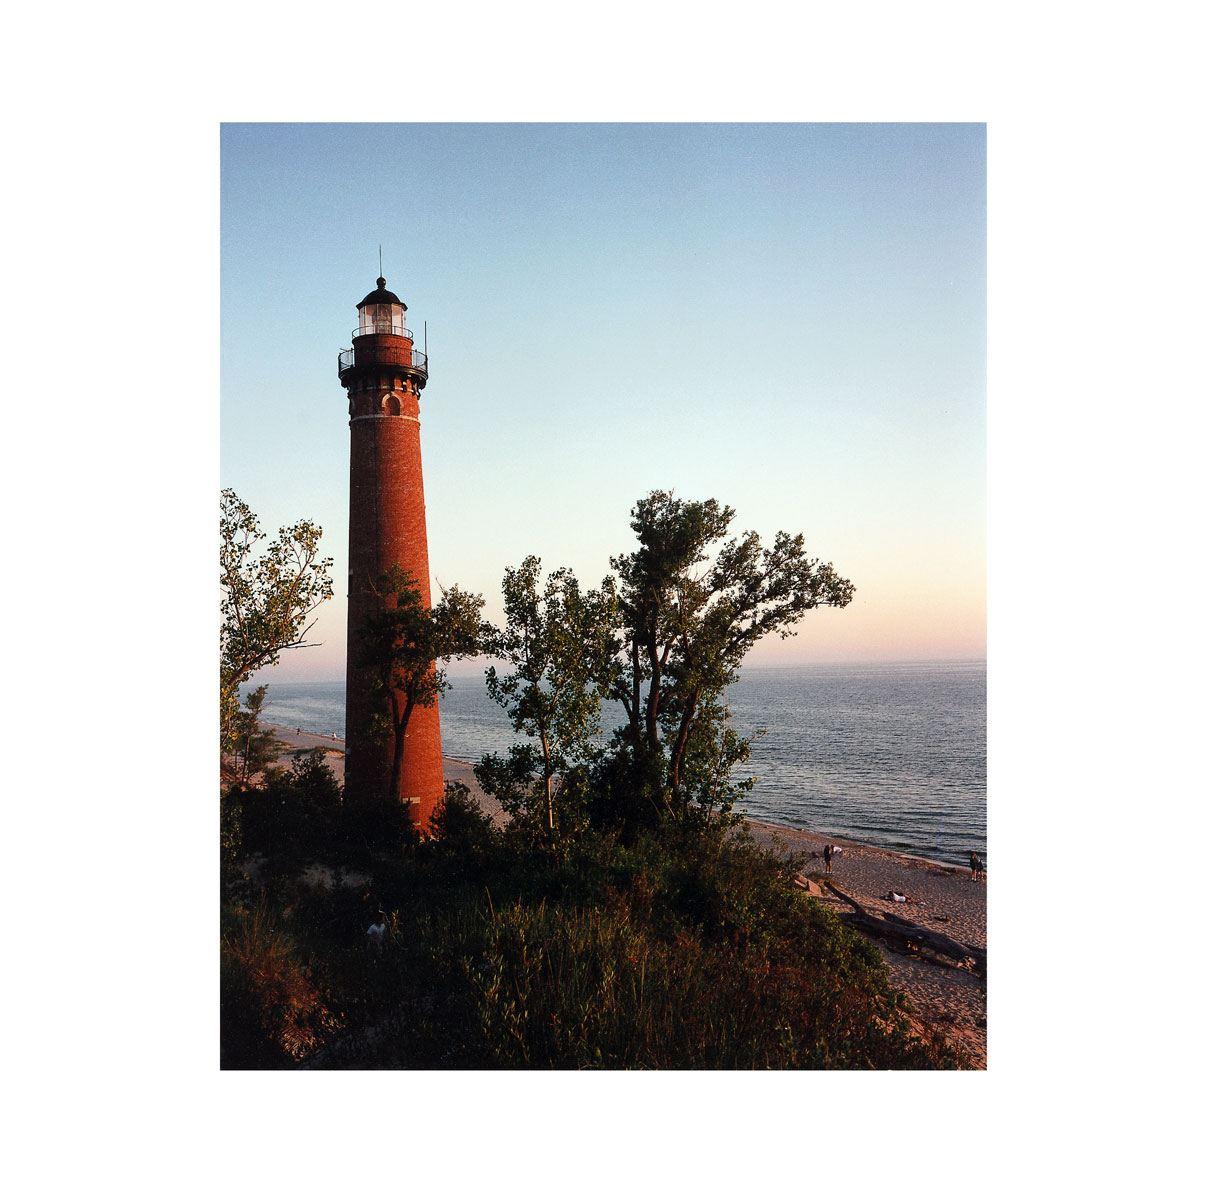 """Lighthouse"" | Village Portrait | Pentwater, Michigan, USA | 1996"